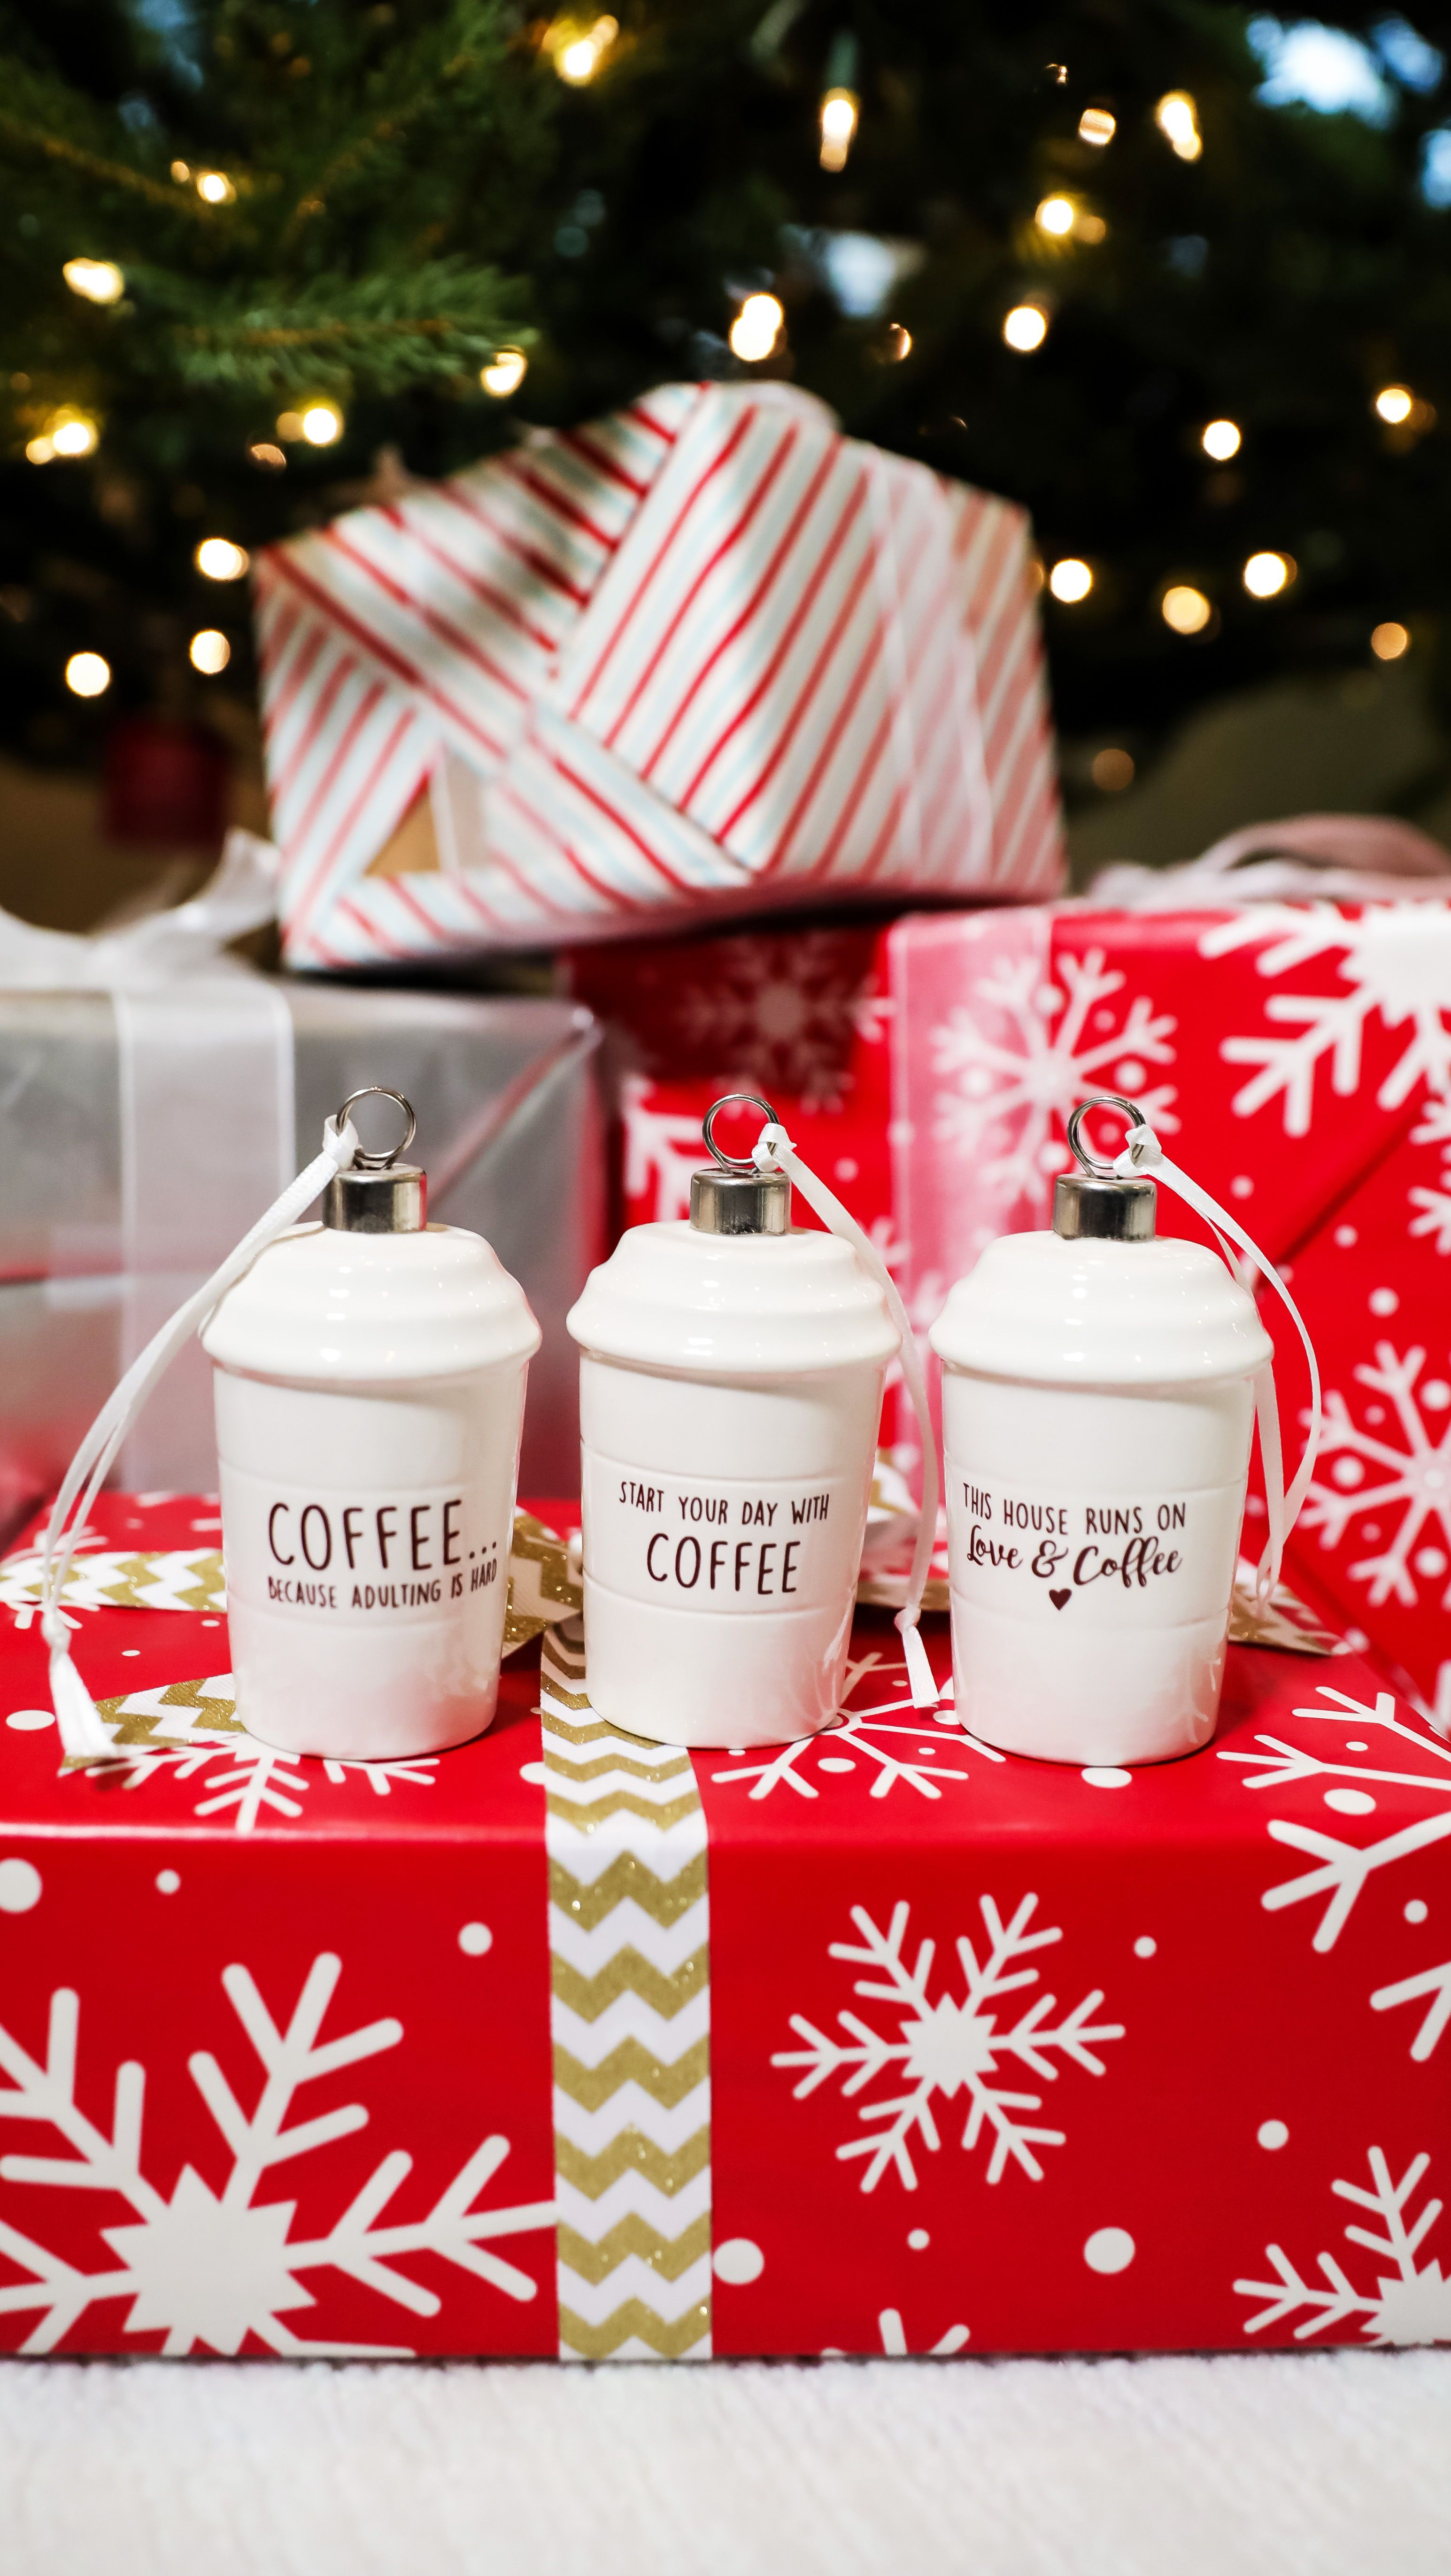 Coffee Mug Ornaments Unique Christmas Gift For Coworker Or Friend Christmasornament Coffeemug Coffeelover Friendgift